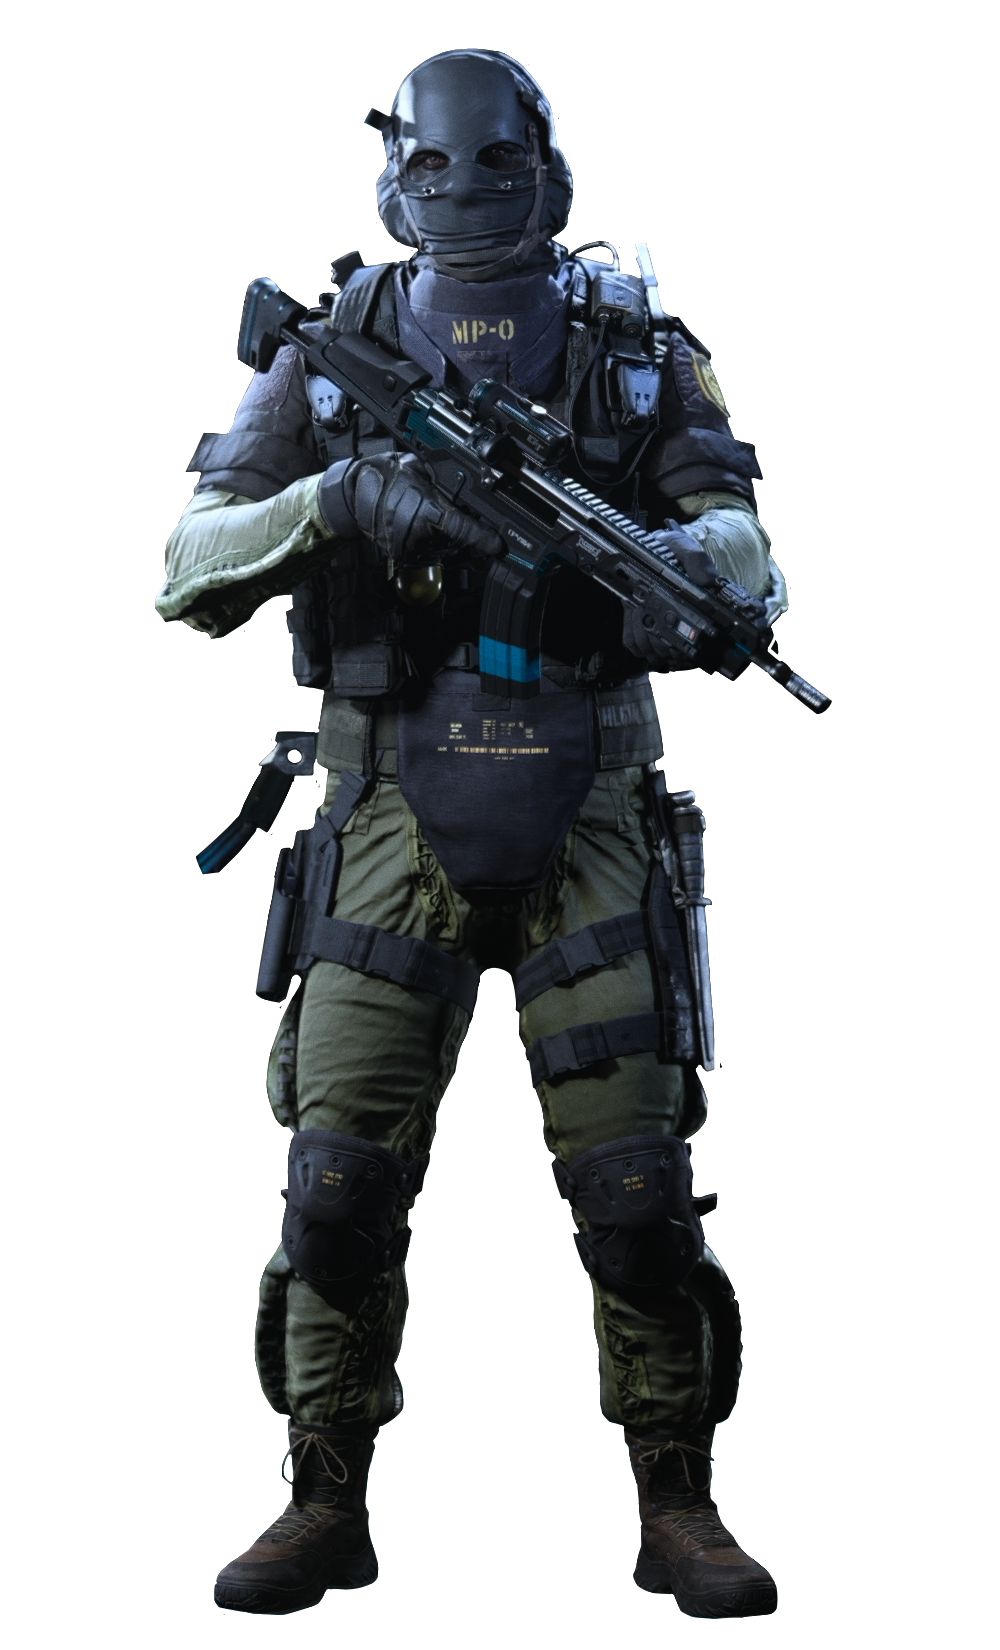 Nikto Call Of Duty Wiki Fandom Military Pictures Modern Warfare Call Of Duty